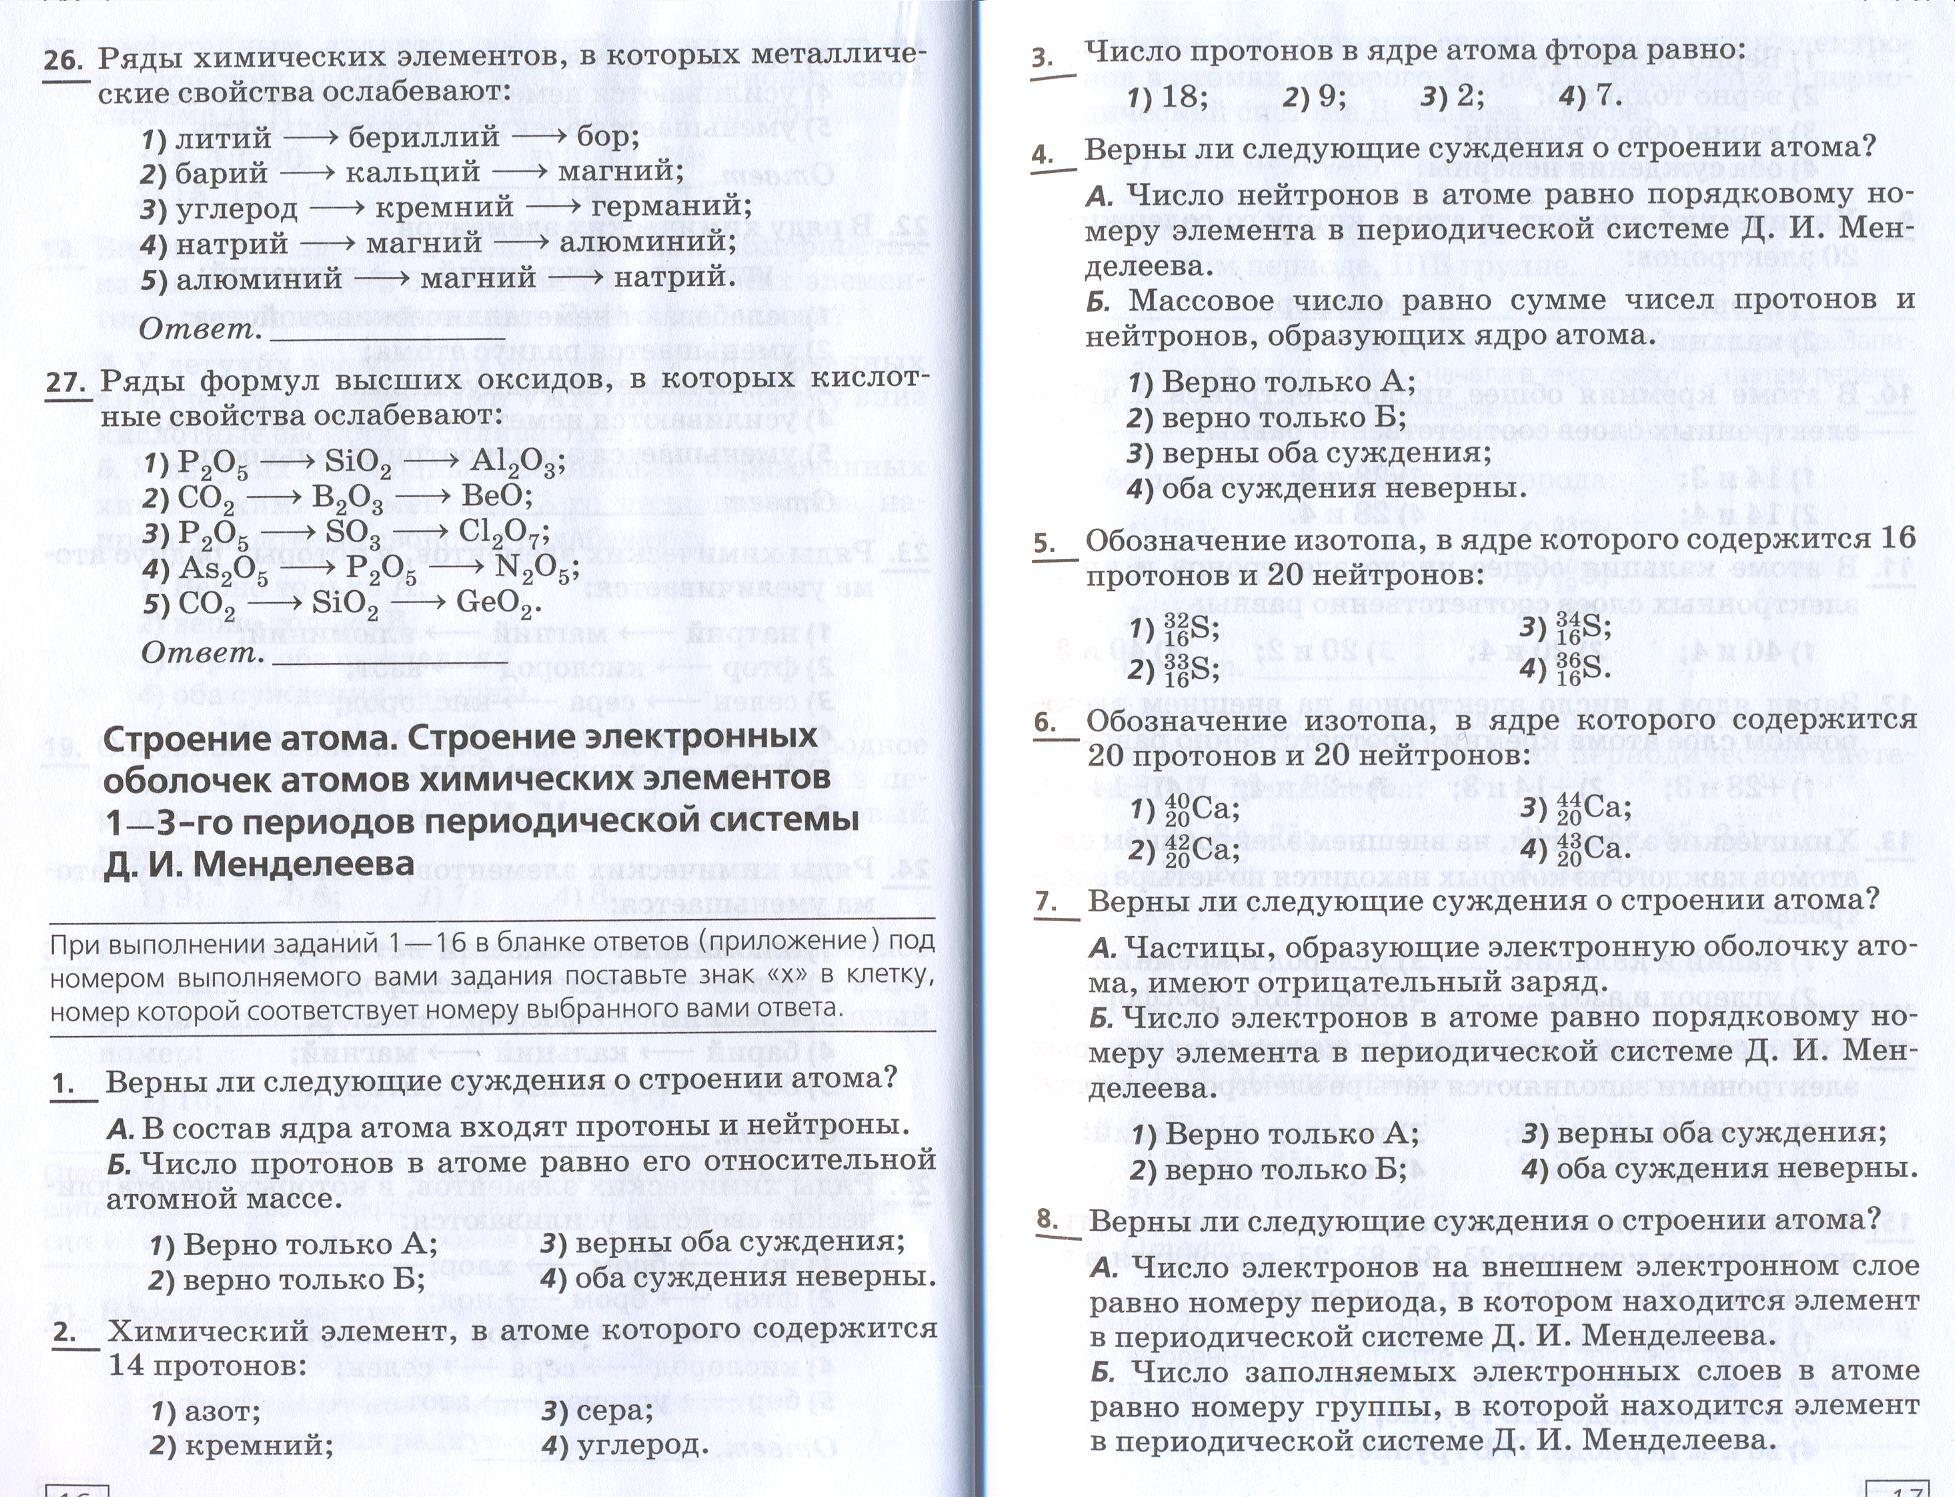 Гдз по алтайскому языку 3 класс